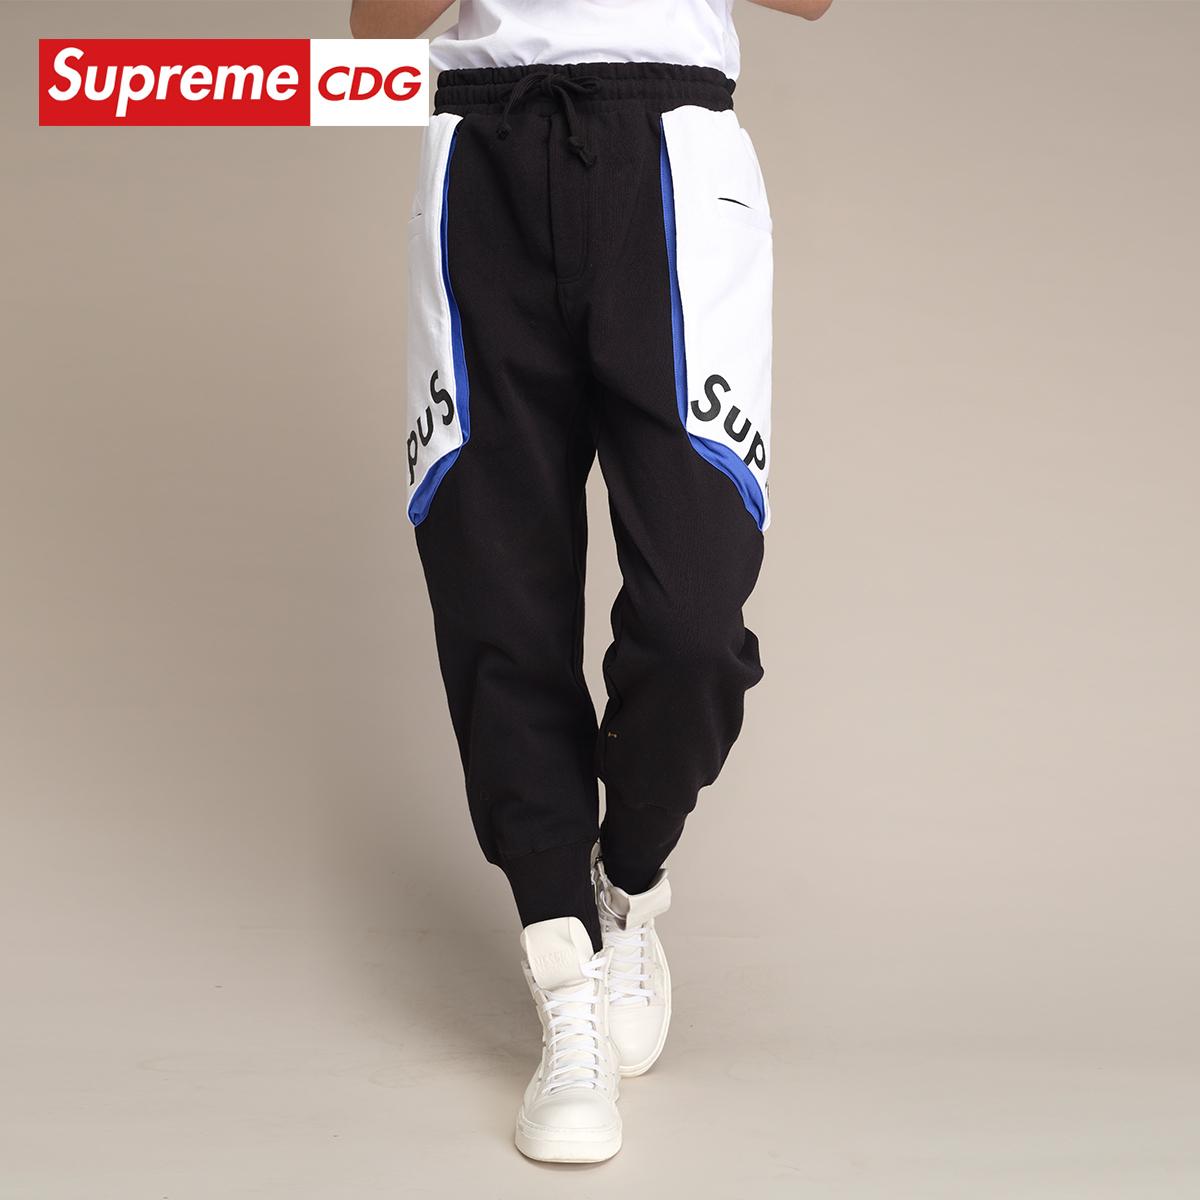 Supreme CDG 2020年春季新款街头百搭白黑色哈伦卫裤休闲裤运动裤